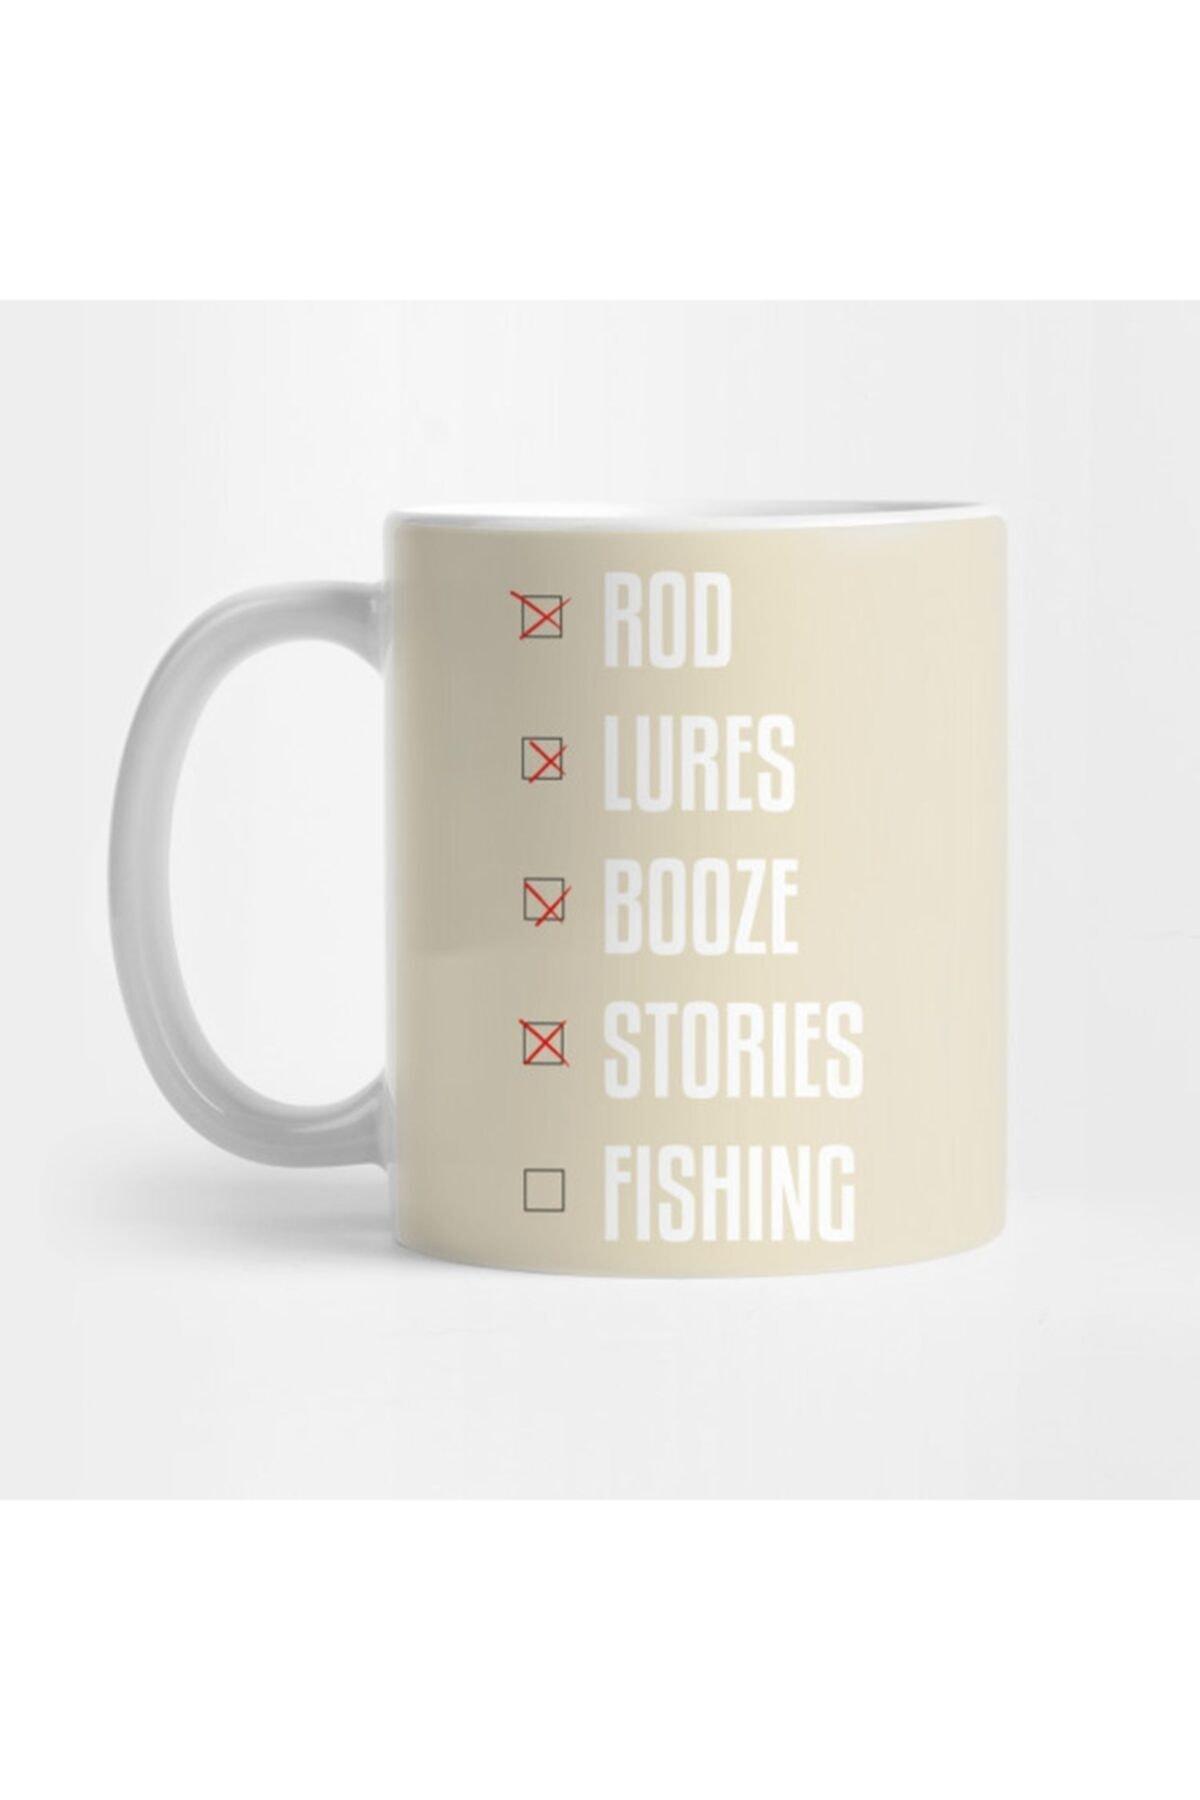 Fishing List Funny Lol Kupa